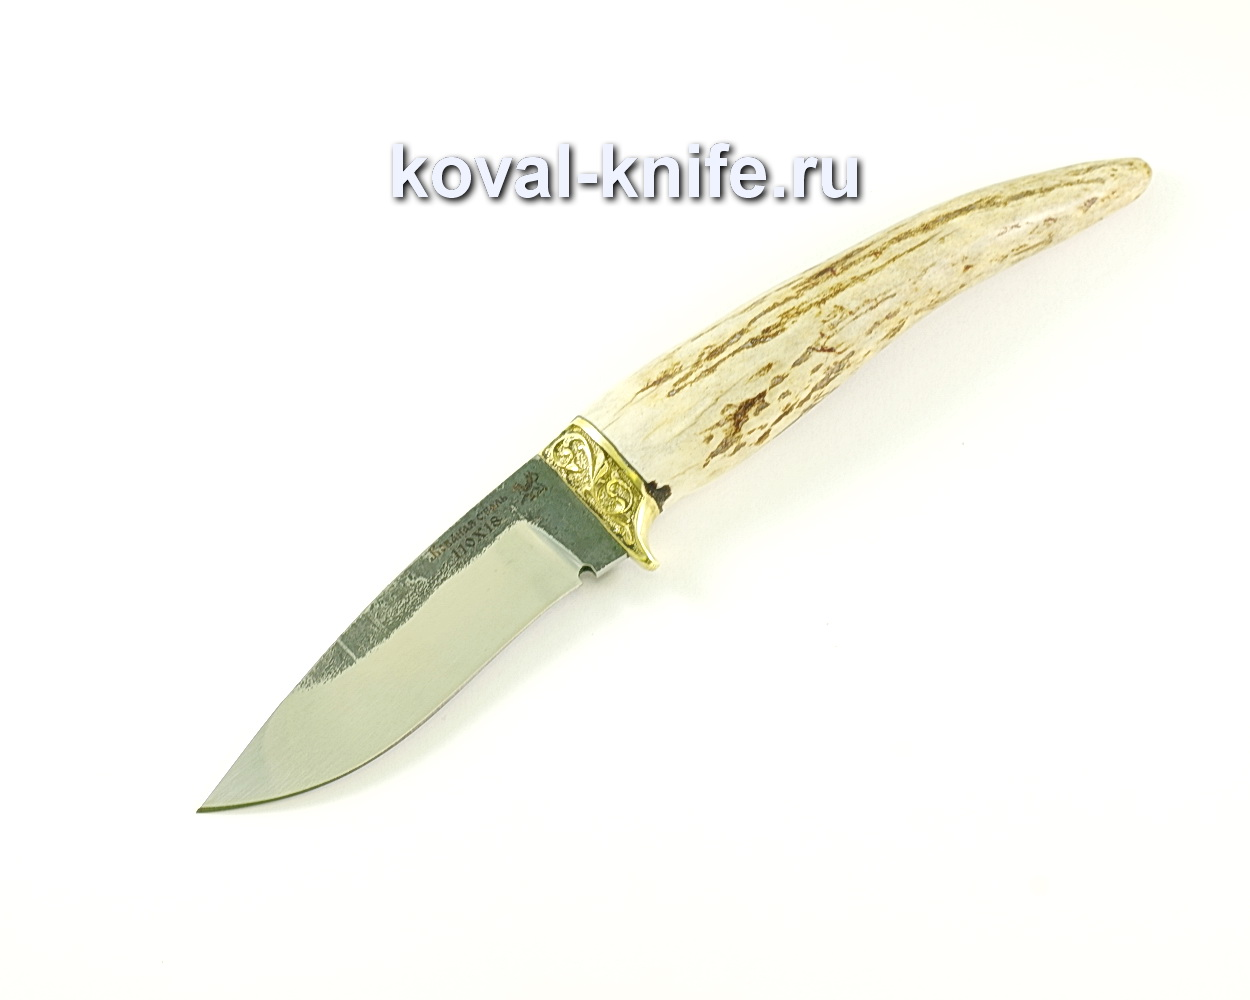 Нож Сапсан (сталь 110х18), рукоять рог лося, литье A032